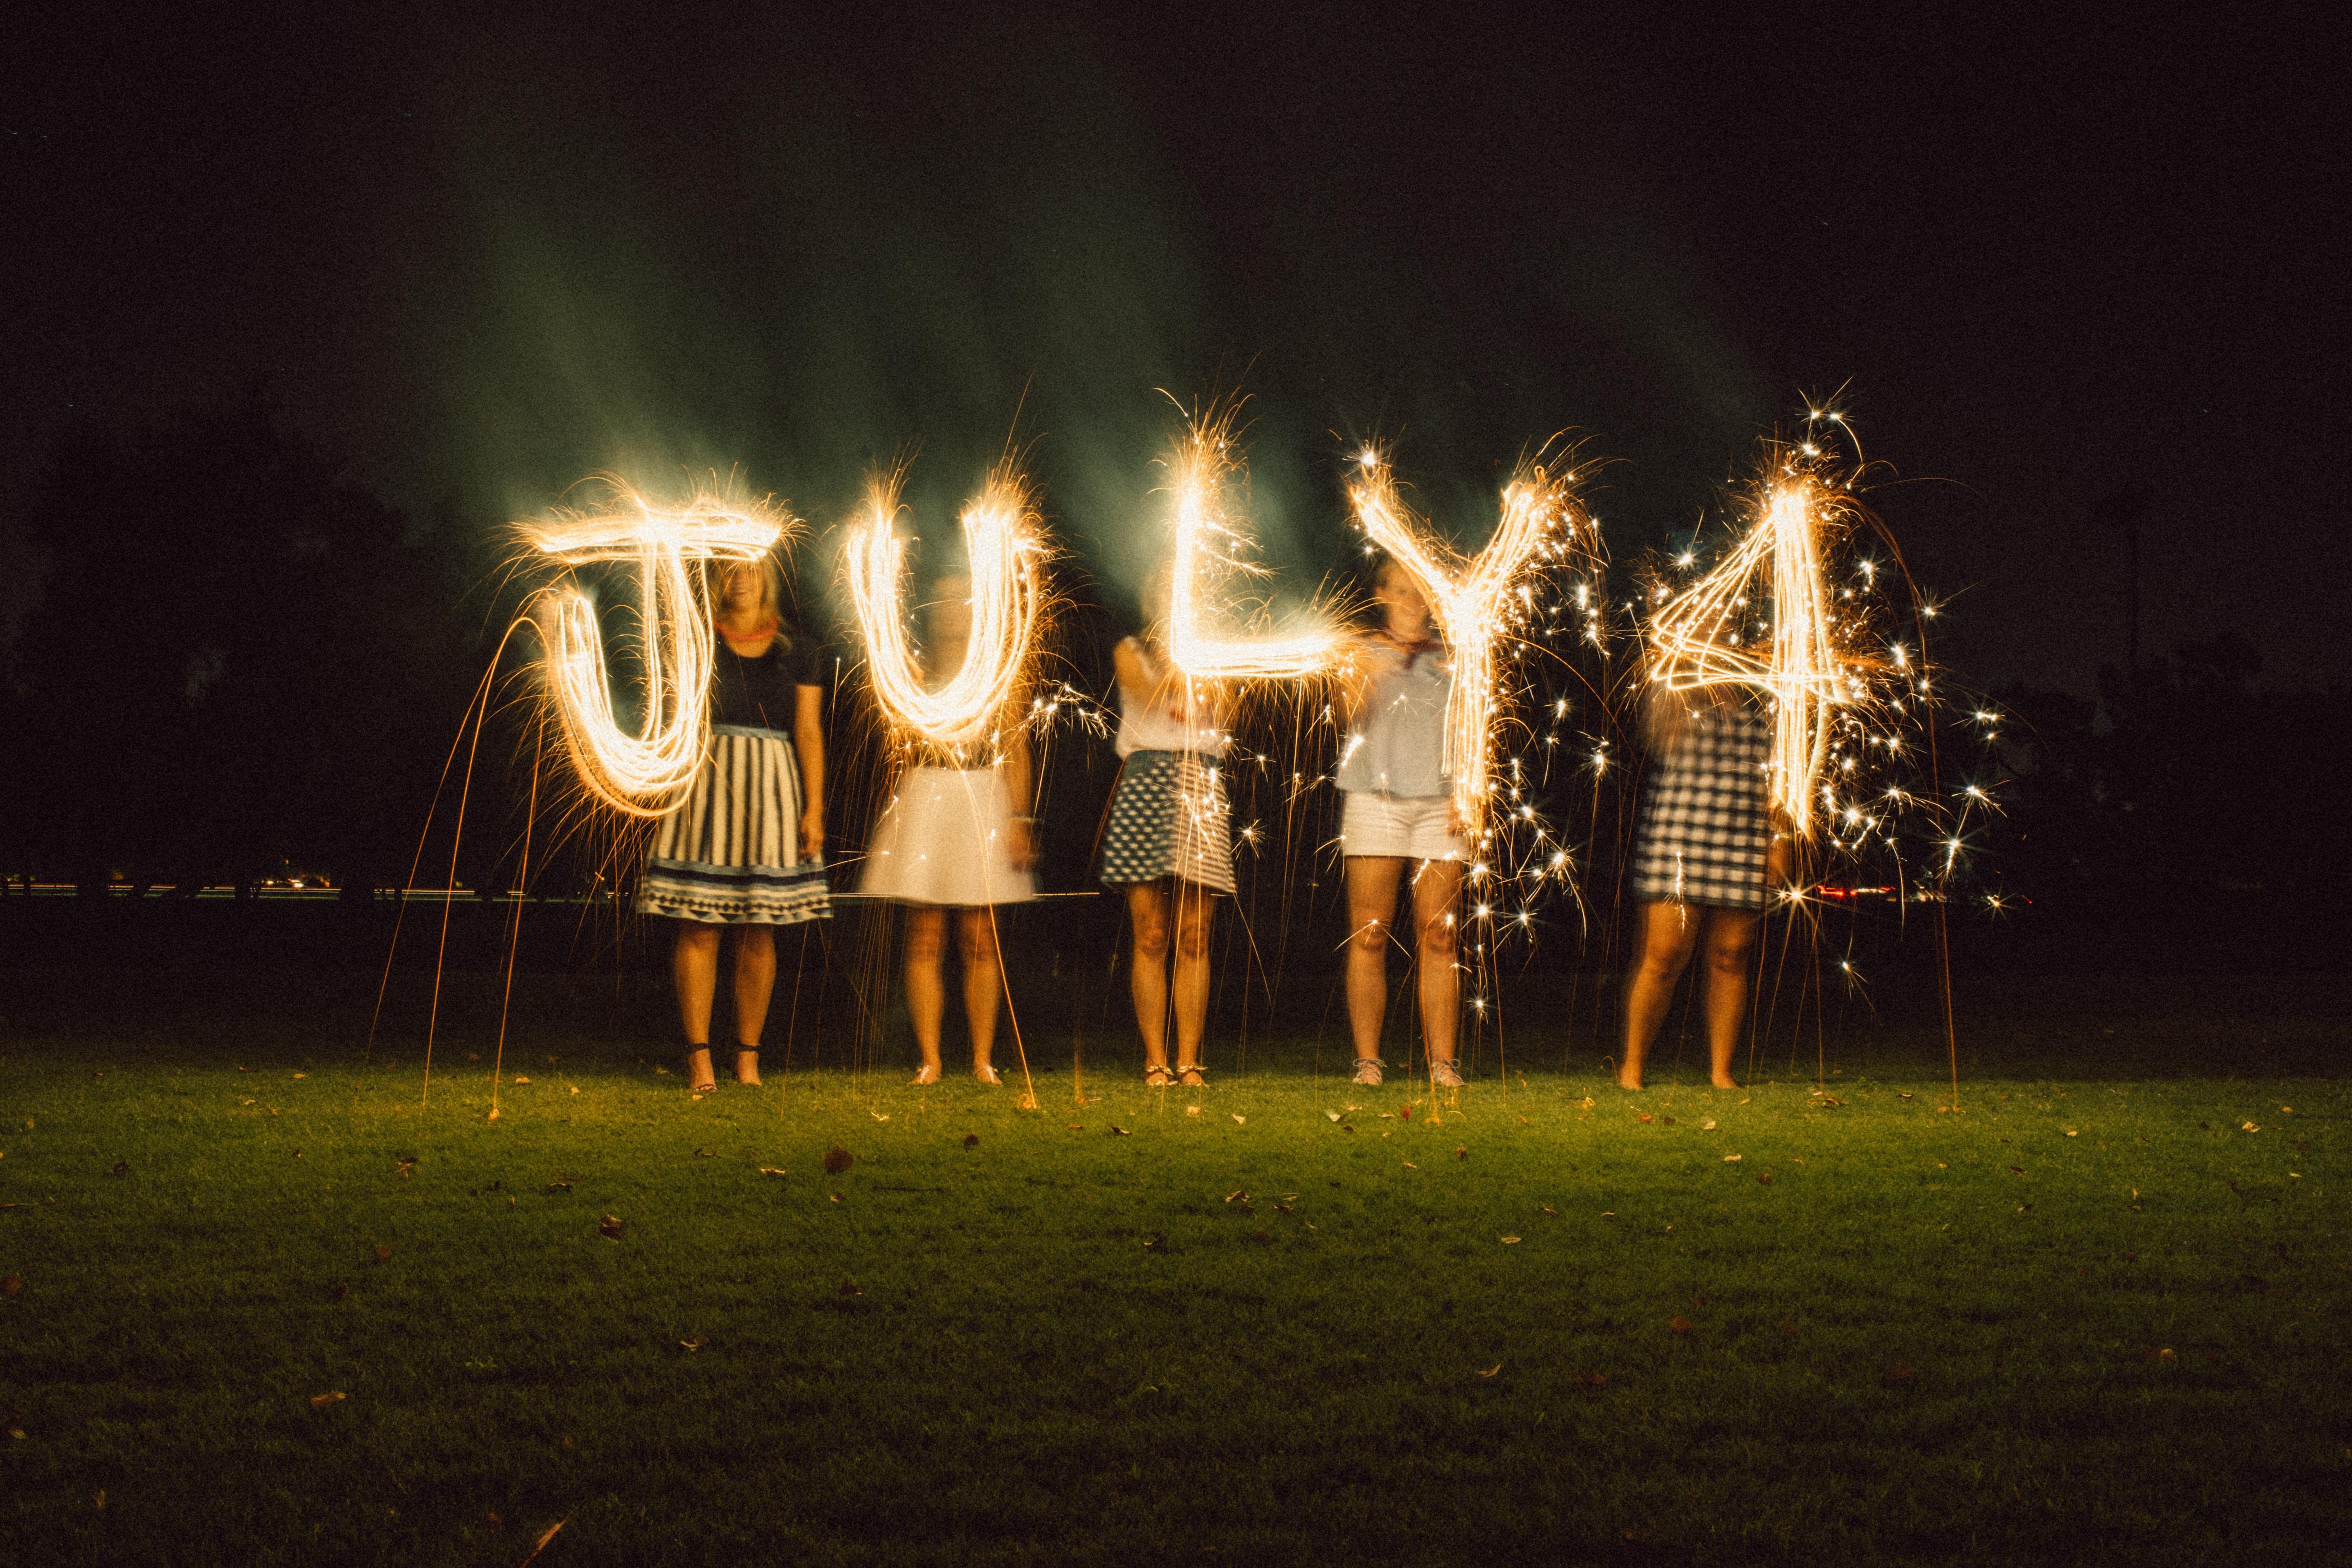 women holding July 4 string lights at night